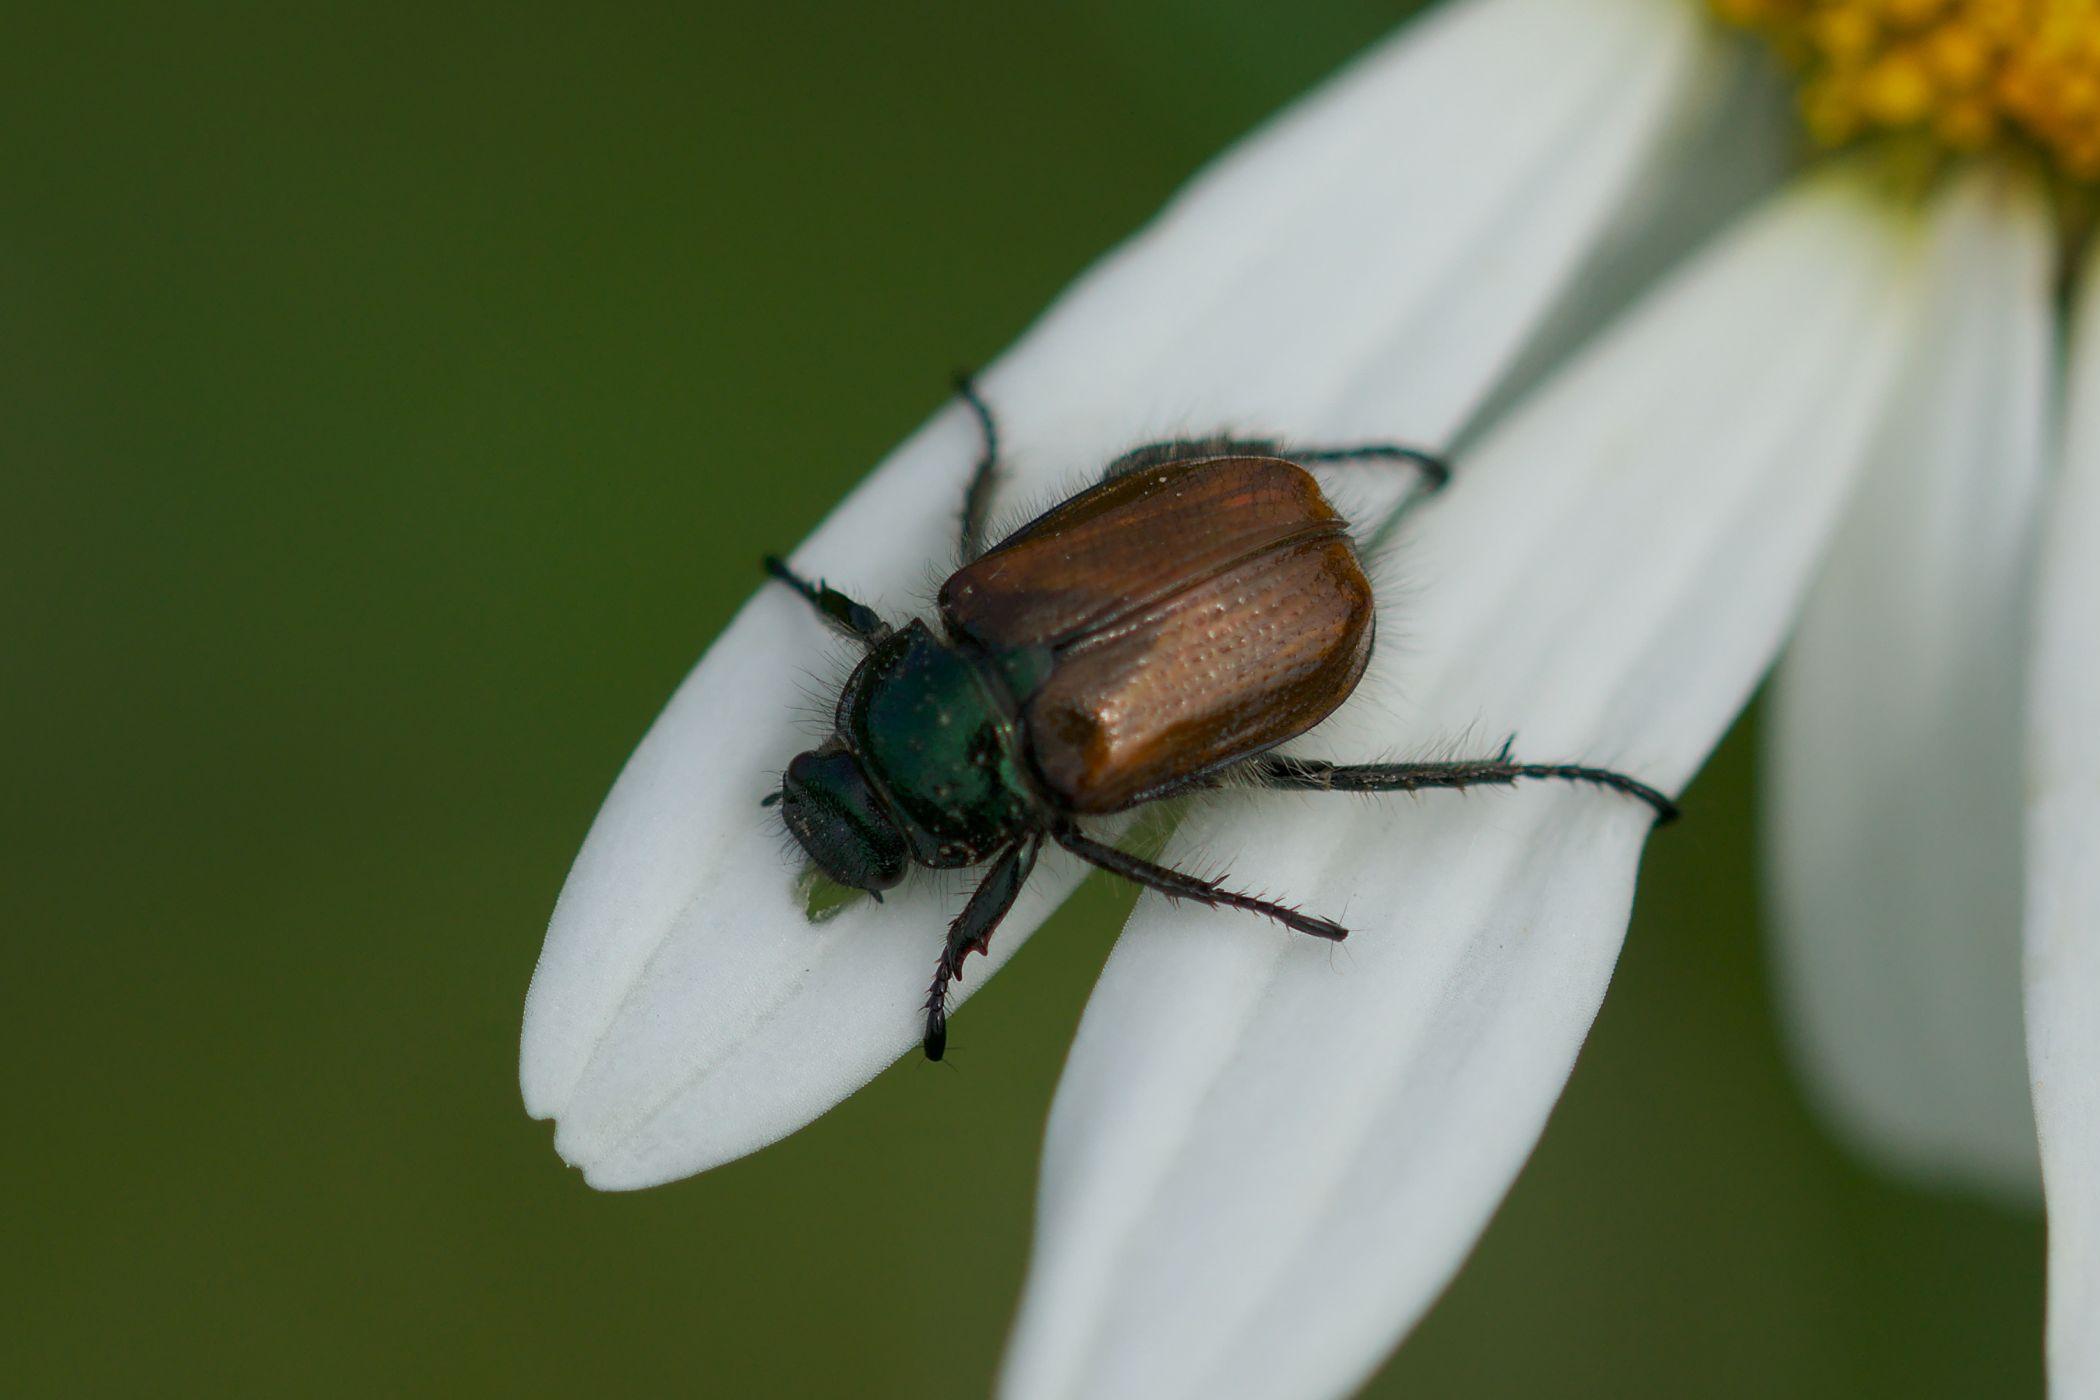 "<a href=""/phyllopertha-horticola/"" target=""_blank"" rel=""noopener noreferrer""><i>Phyllopertha horticola</i> (Gartenlaubkäfer)</a>"